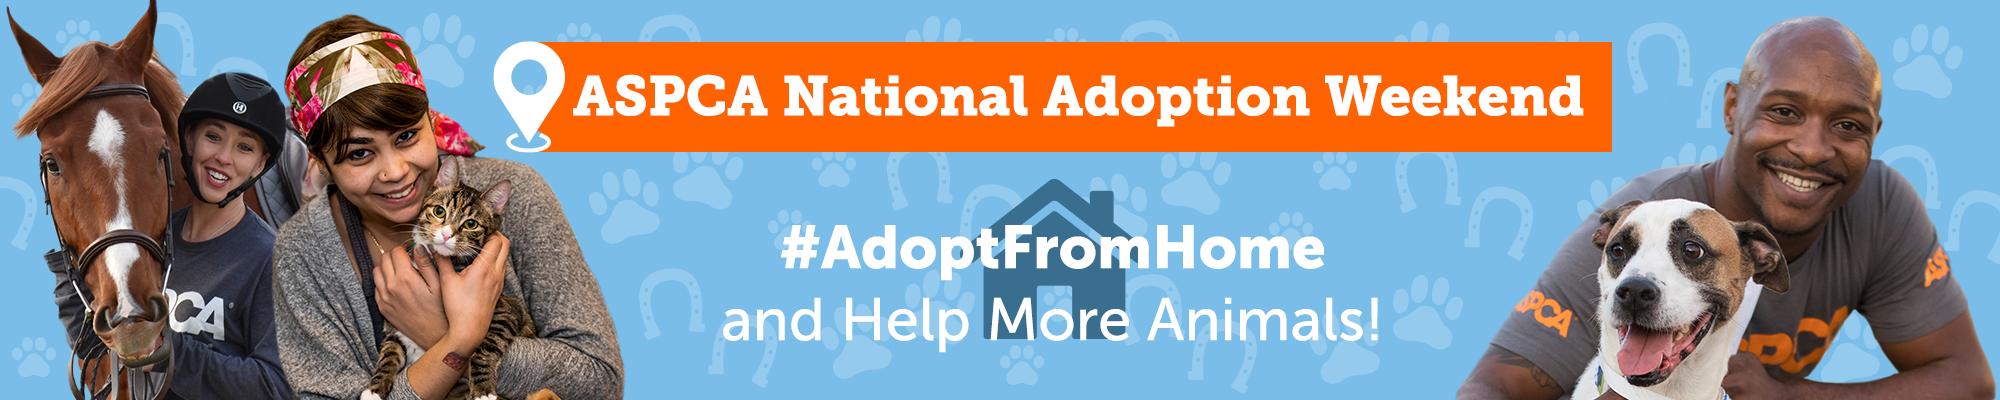 ASPCA National Adoption Weekend